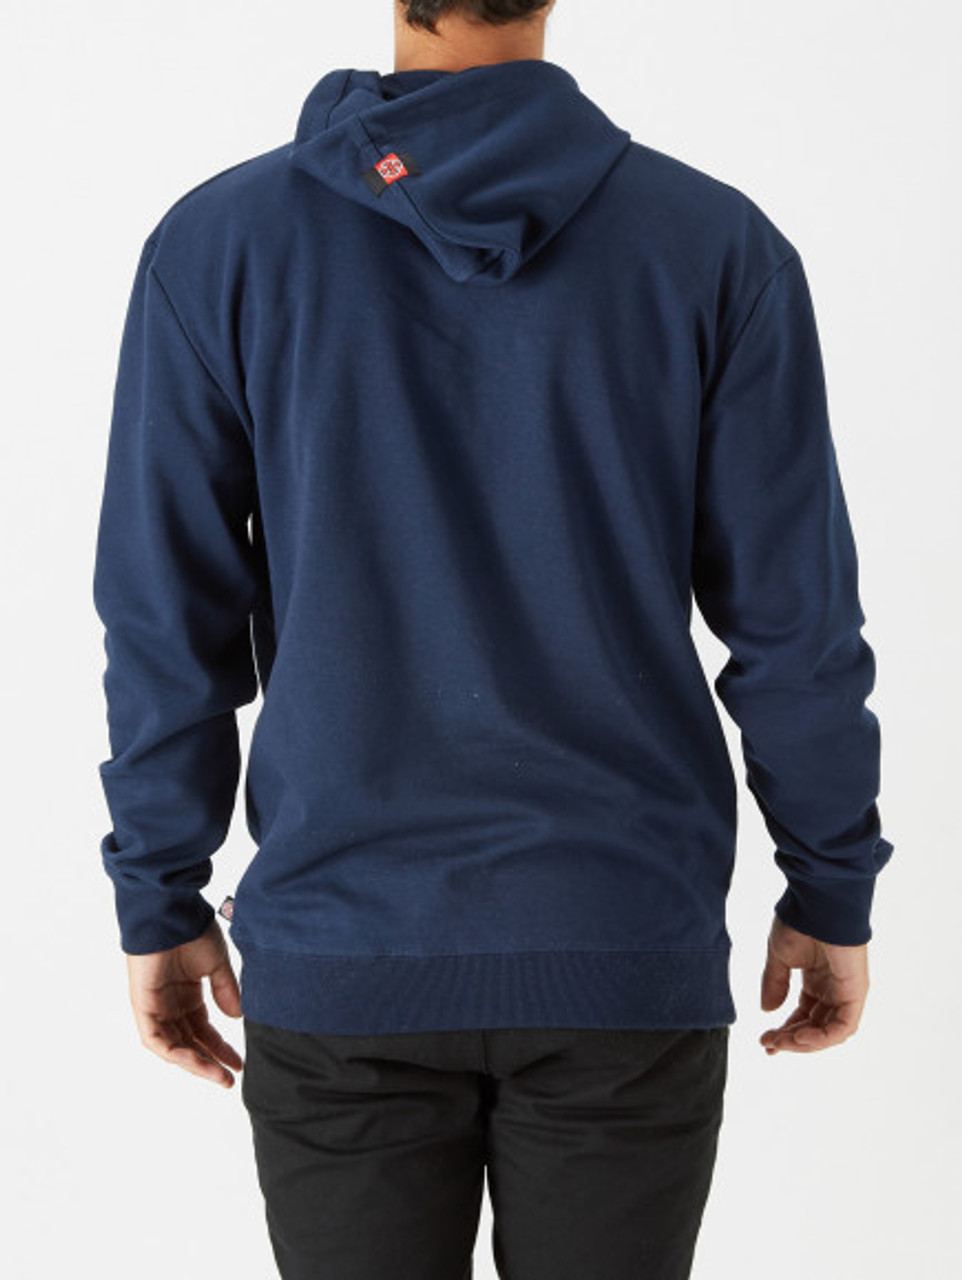 Independent BTGC Patch Hooded Sweatshirt Navy